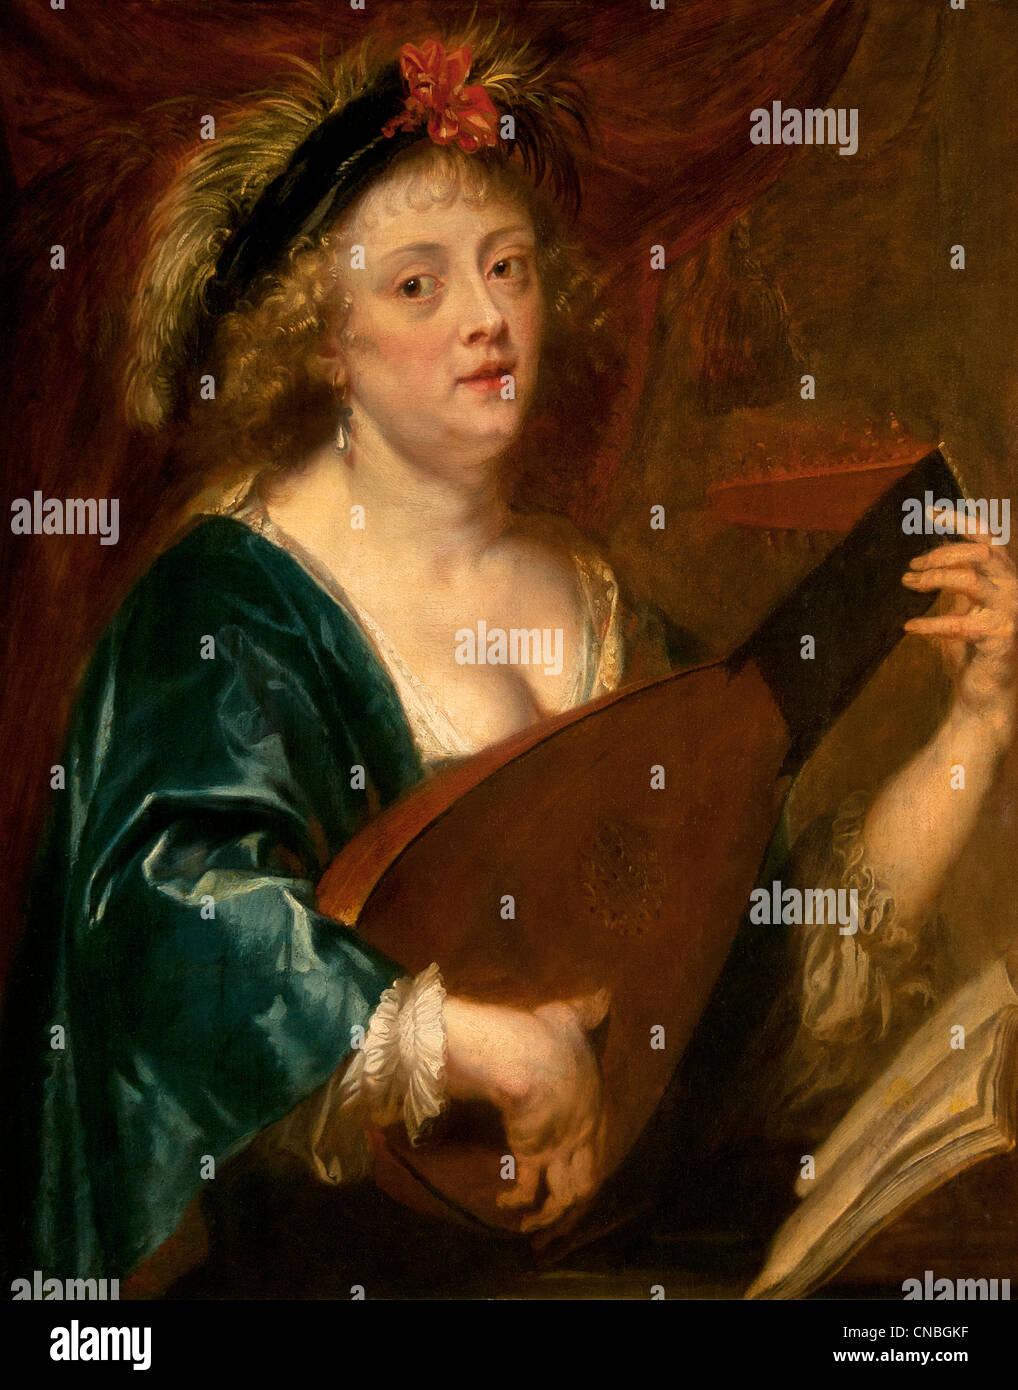 Portrait de Femme Jouant au Luth - Porträt der Frau spielt die Laute von Jan van Den Hoecke 1611 ? 1651 Belgien Stockbild